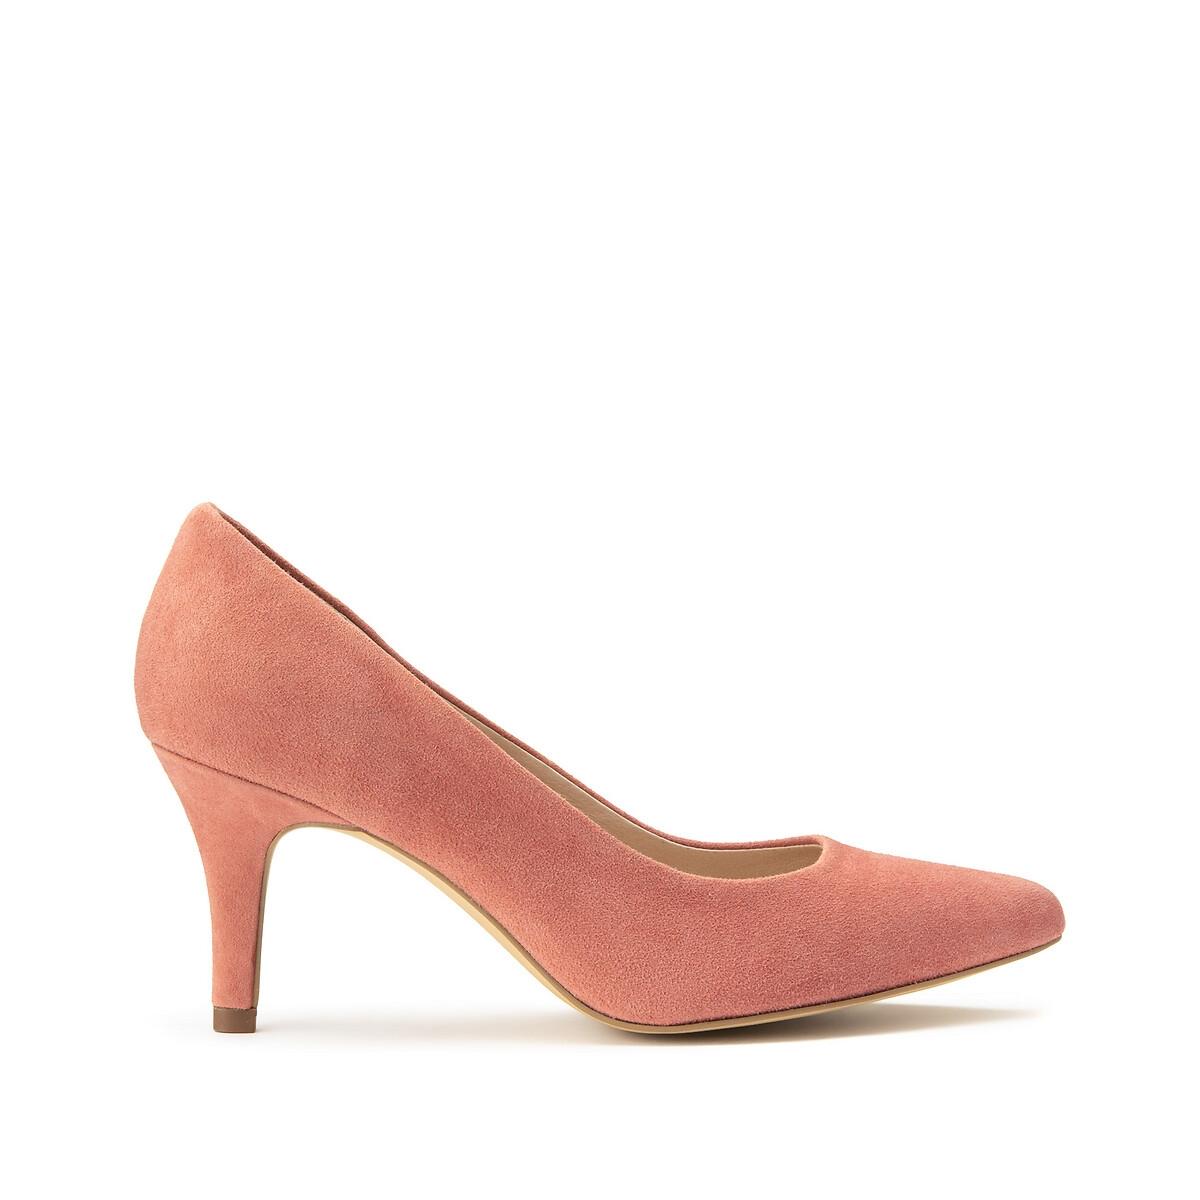 Туфли LaRedoute Из кожи на каблуке-шпильке 36 оранжевый